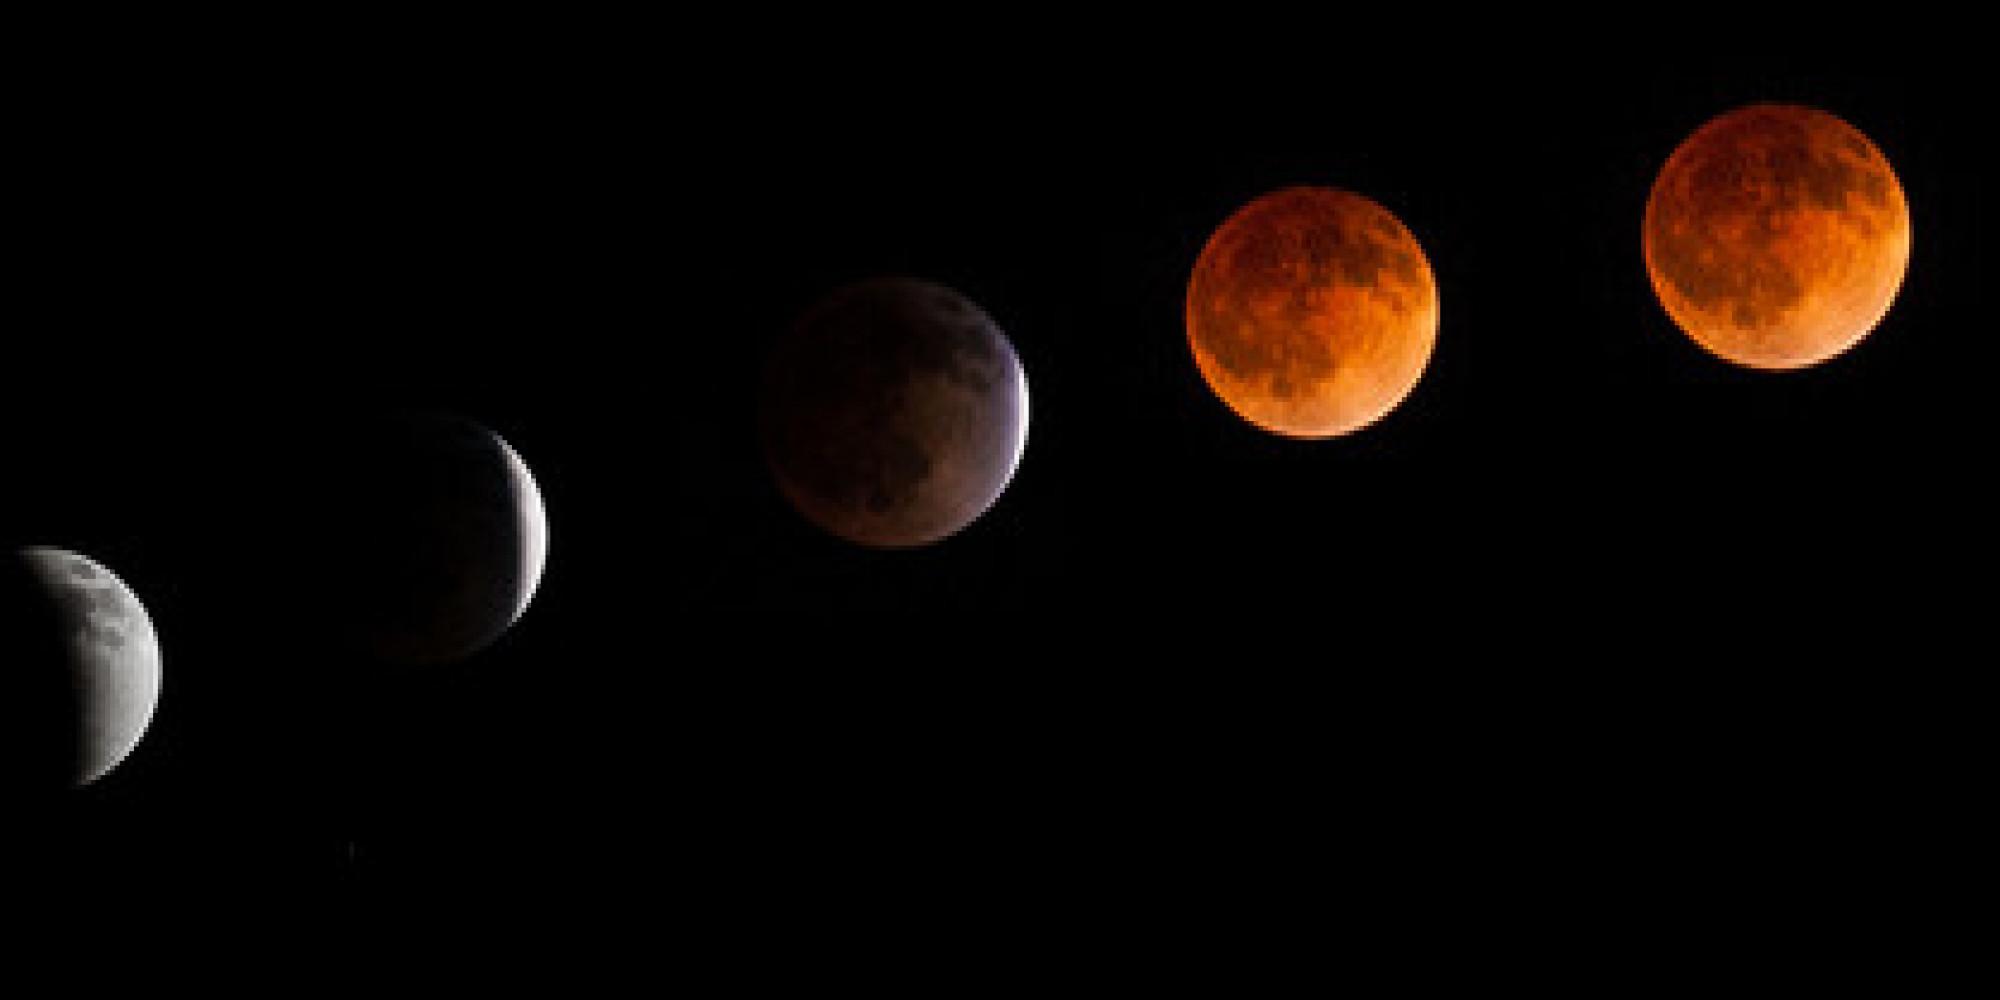 blood moon tonight canada - photo #43